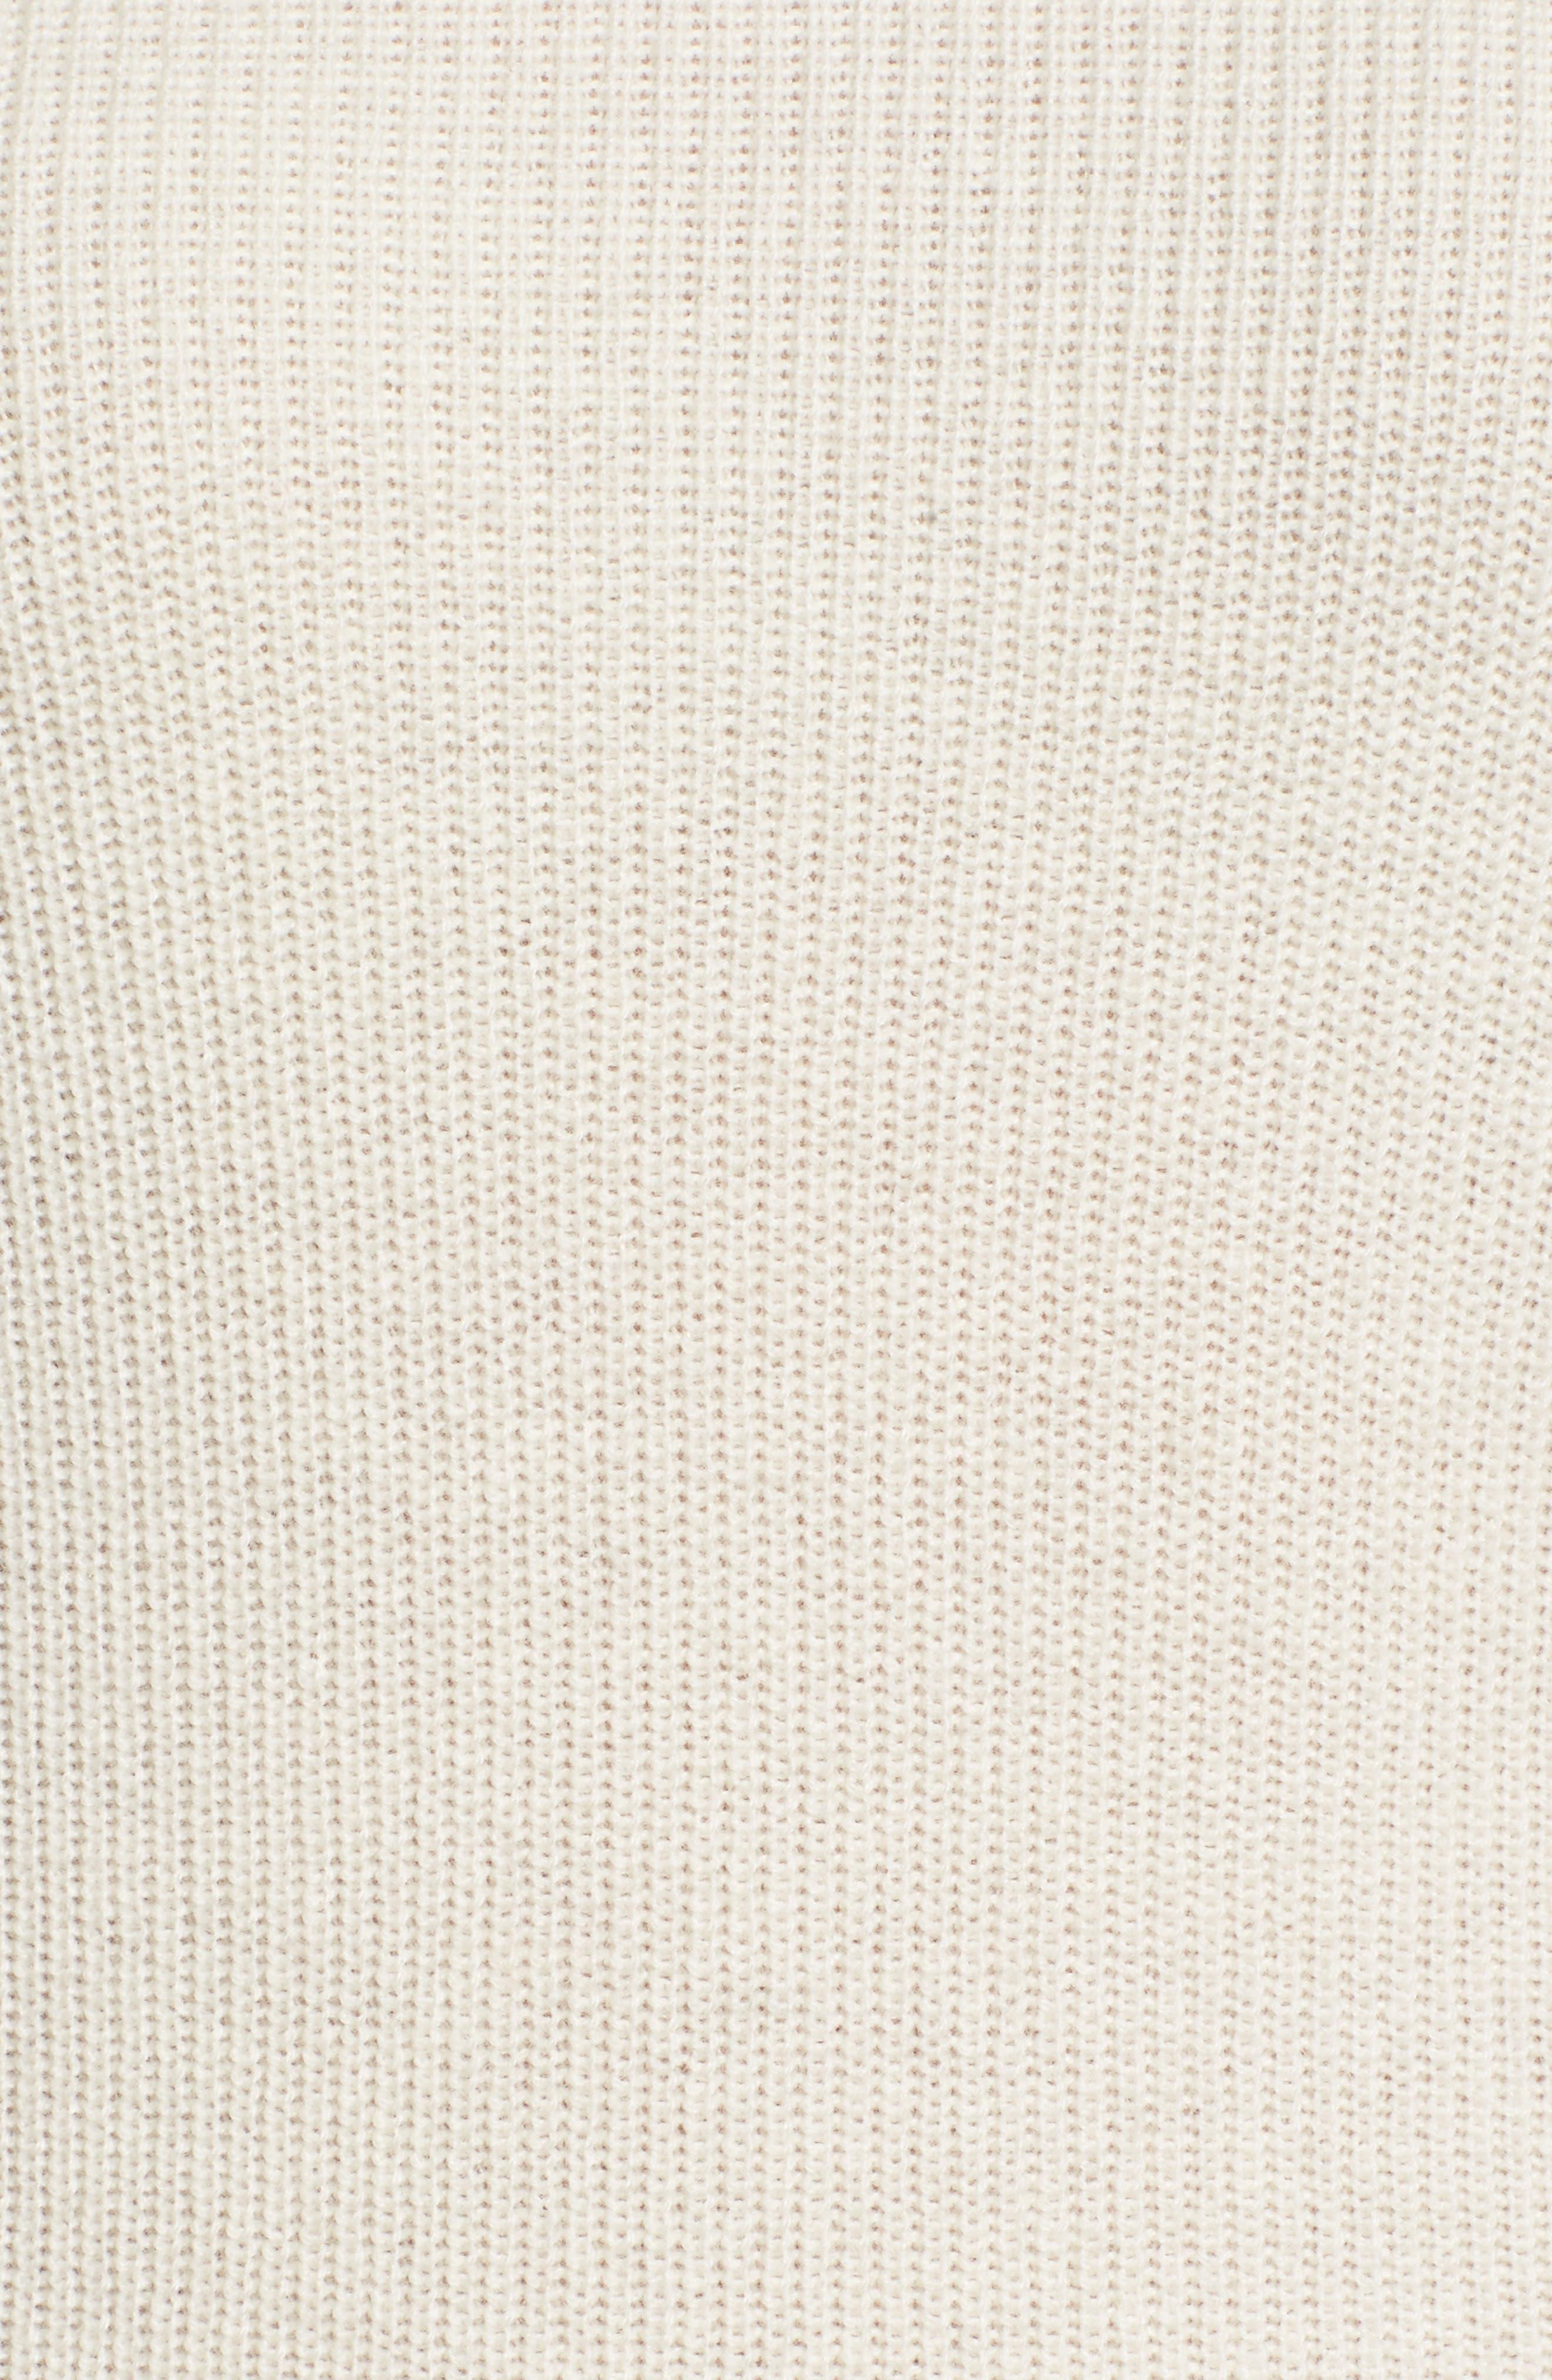 Cold Shoulder Cashmere Sweater,                             Alternate thumbnail 5, color,                             Milk